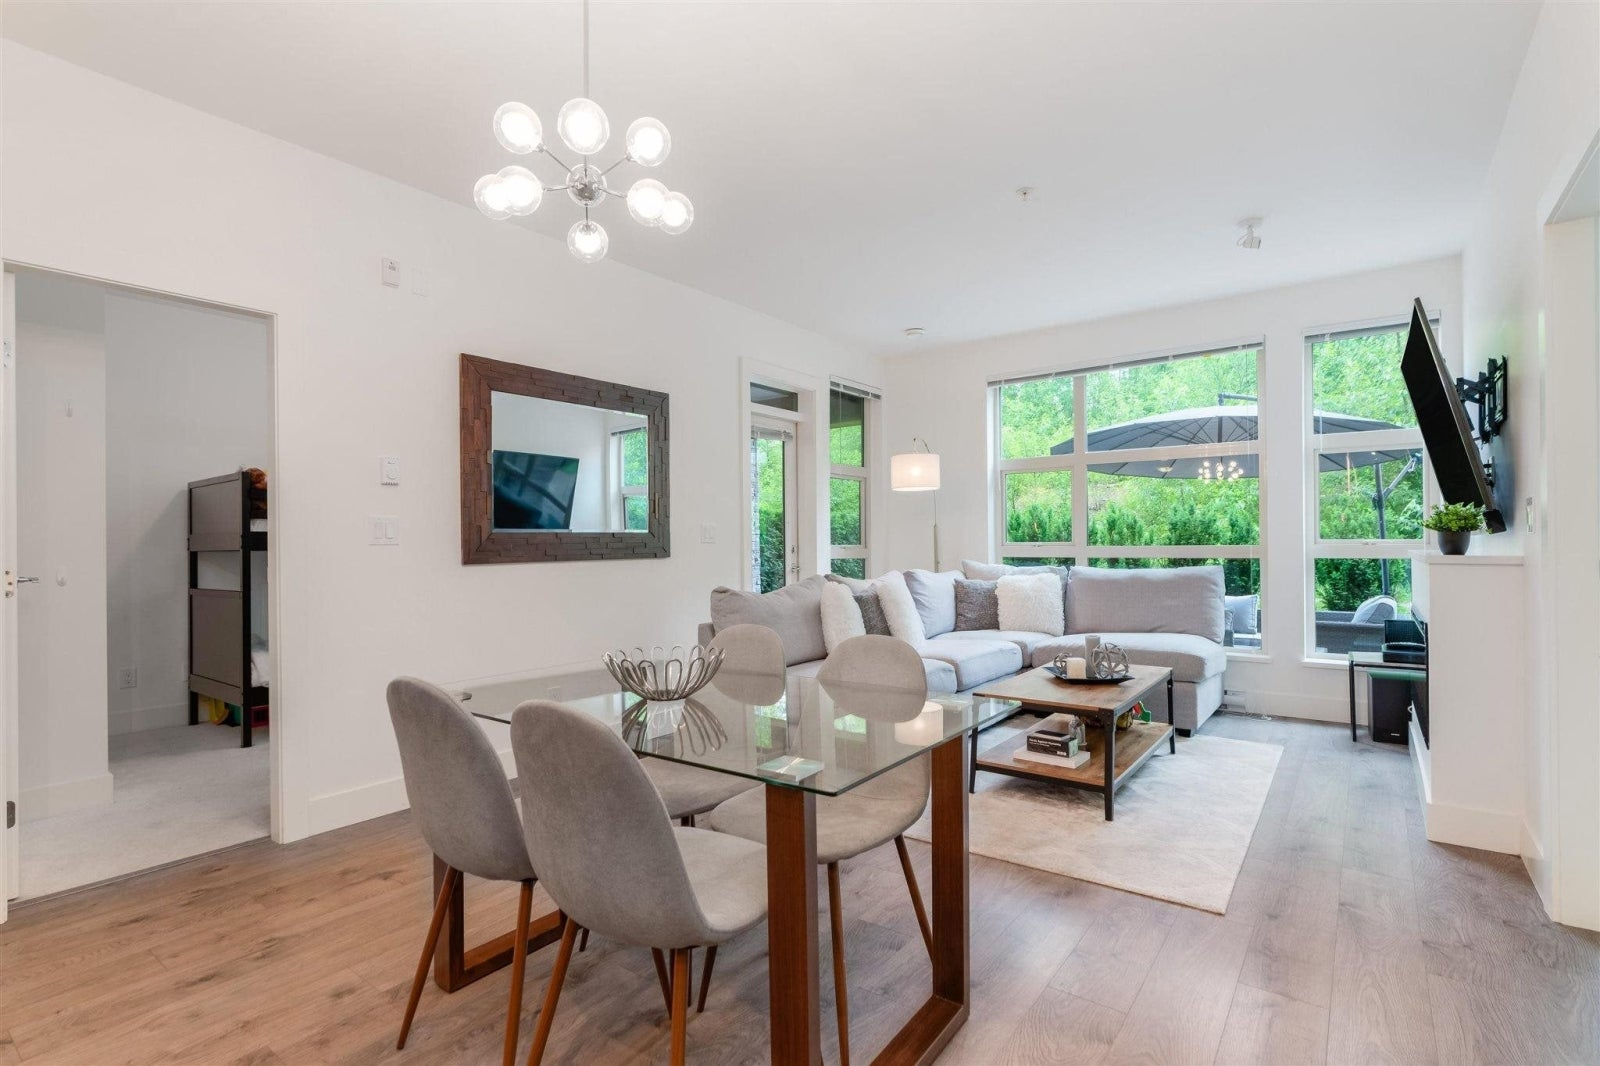 222 3602 ALDERCREST DRIVE - Roche Point Apartment/Condo for sale, 2 Bedrooms (R2603975) #7